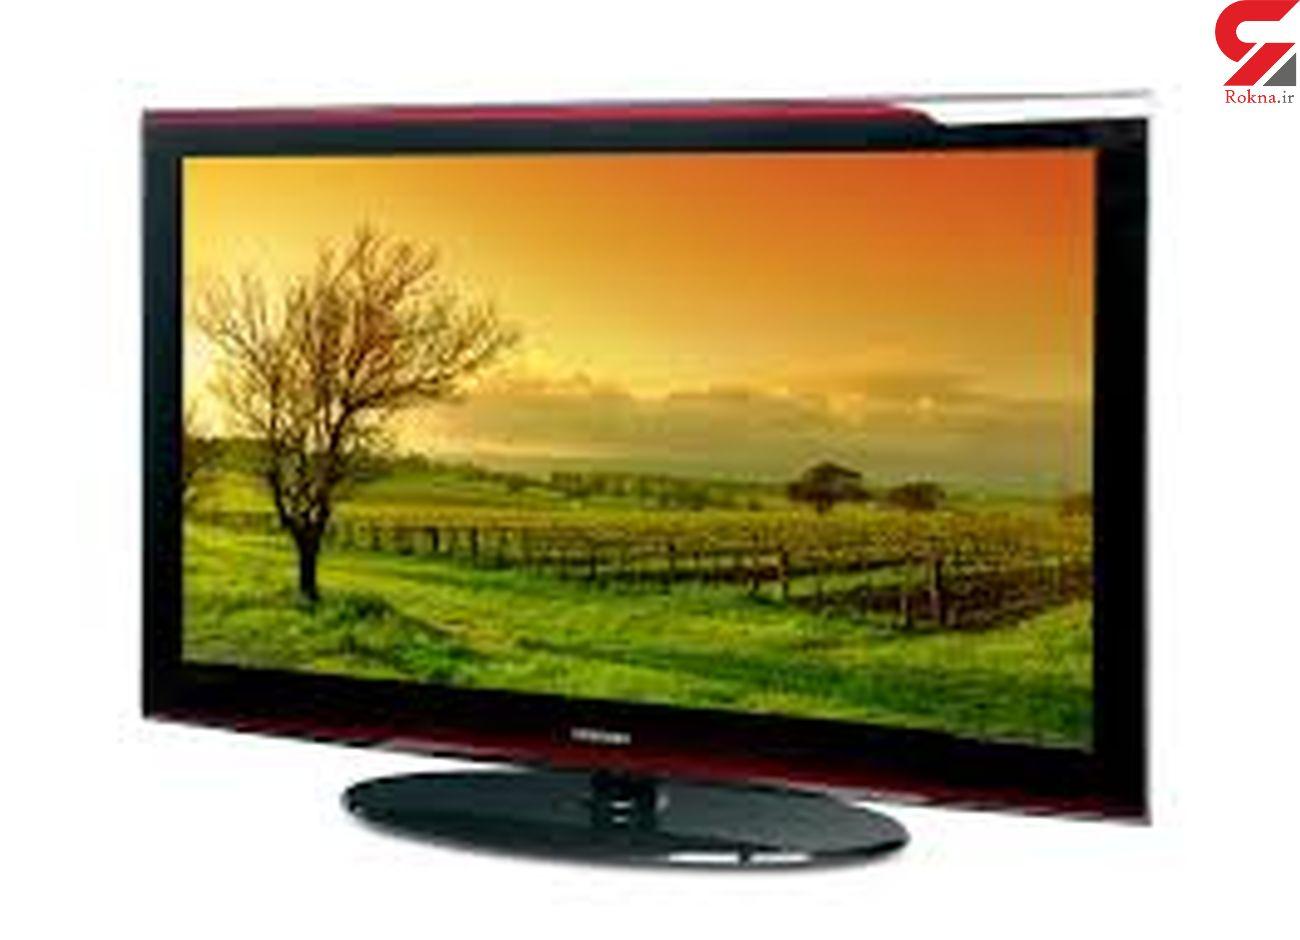 چگونه تلویزیون LCD را تمیز کنیم؟